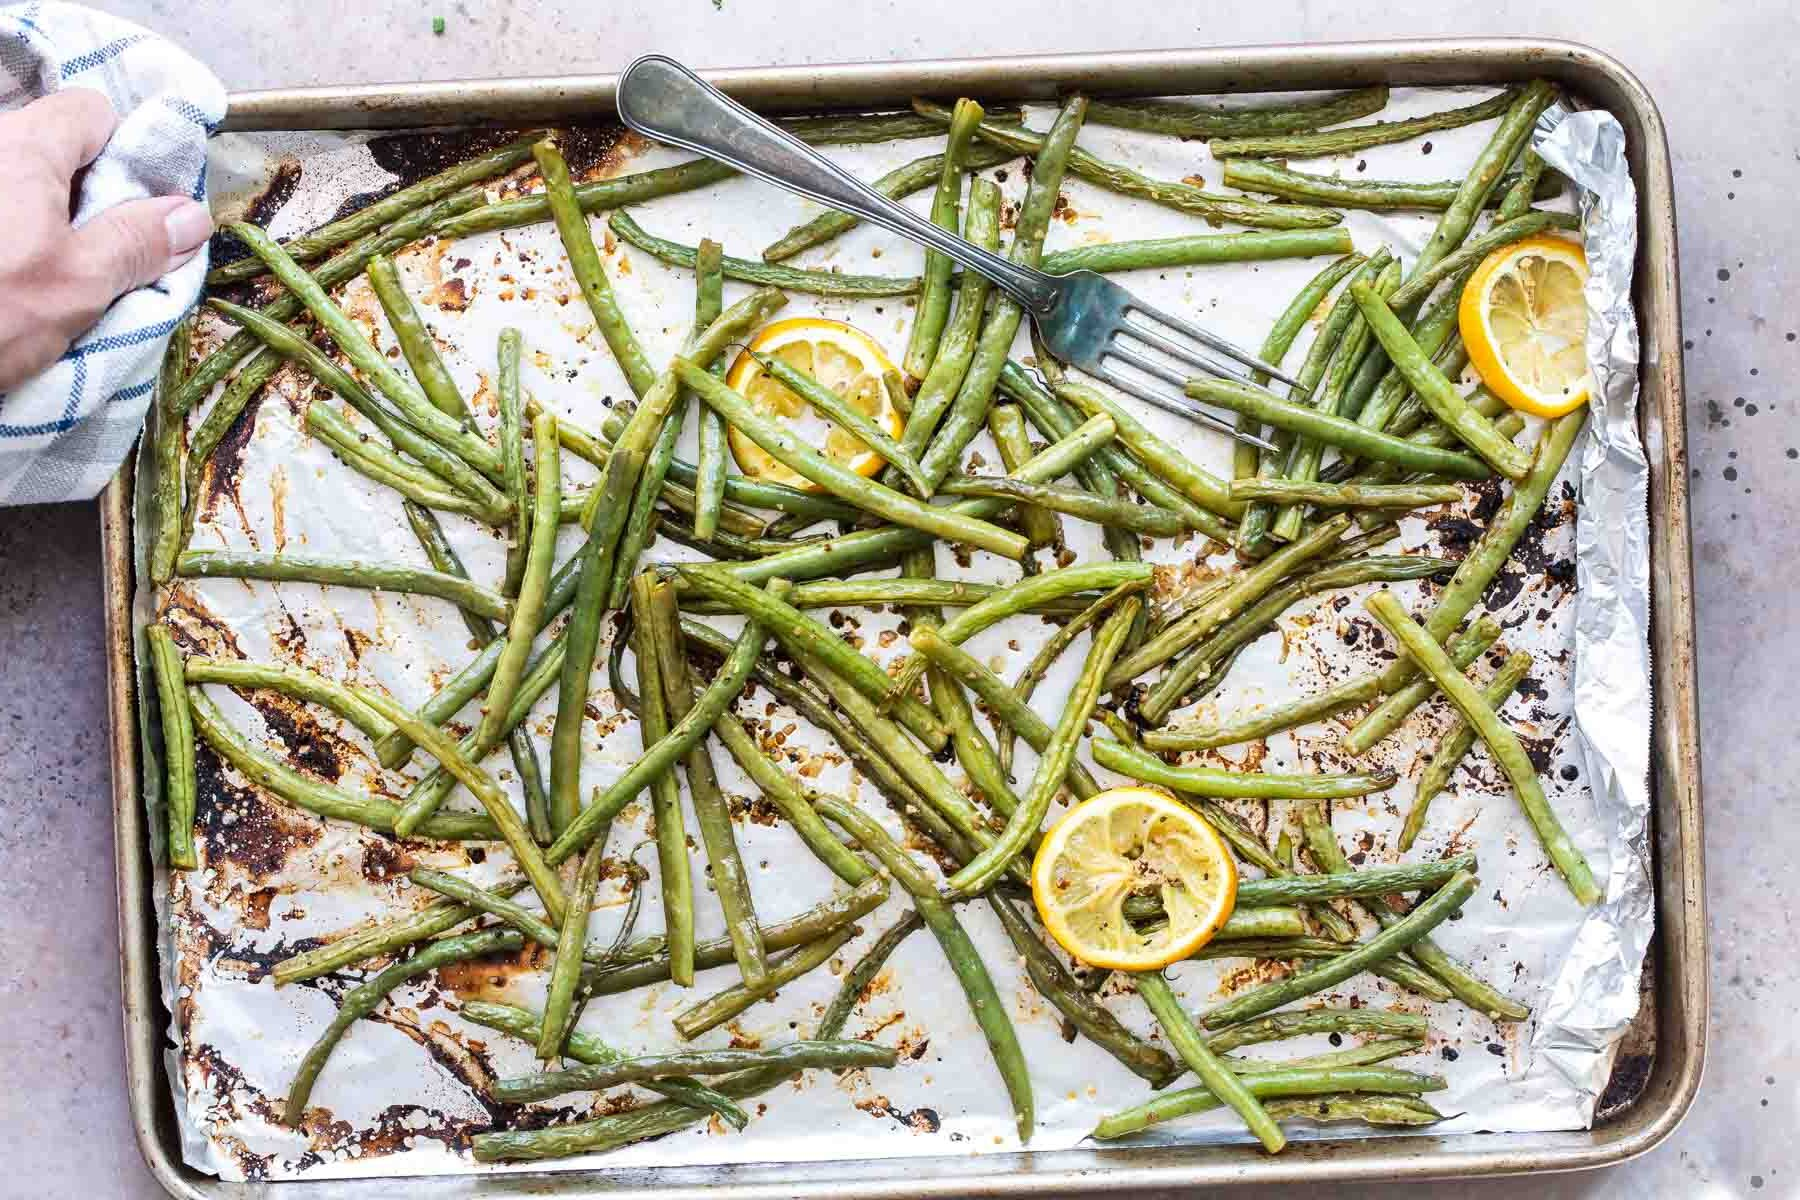 Roasted green beans on a baking sheet with lemon garnish.